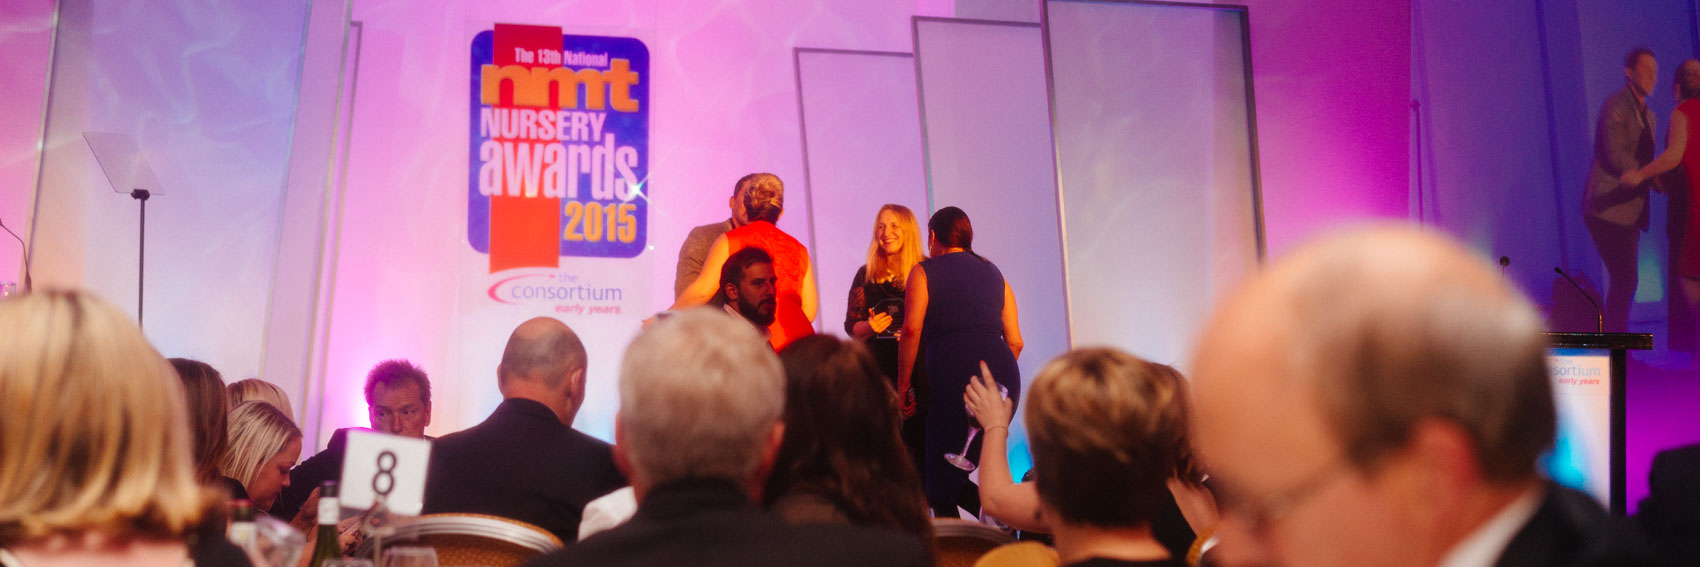 nmt-awards-2015_11_28-1376-125375-013.jpg